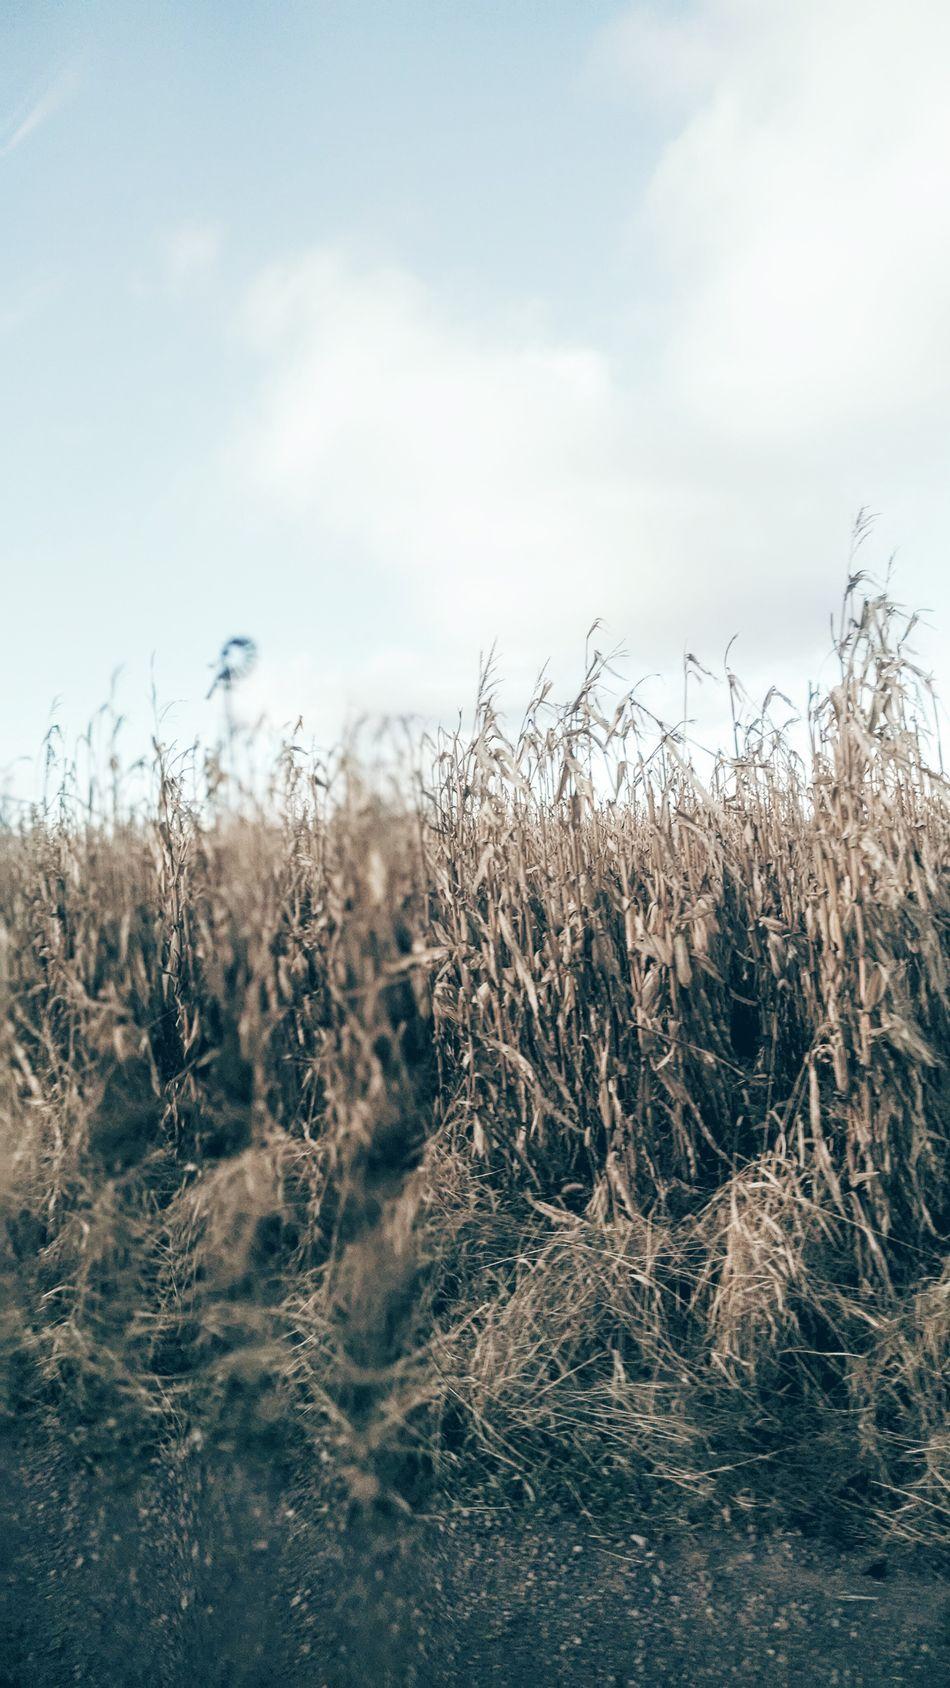 Enjoying Life Landscapes With WhiteWall Gods Beauty Here Belongs To Me Roadlesstravelled